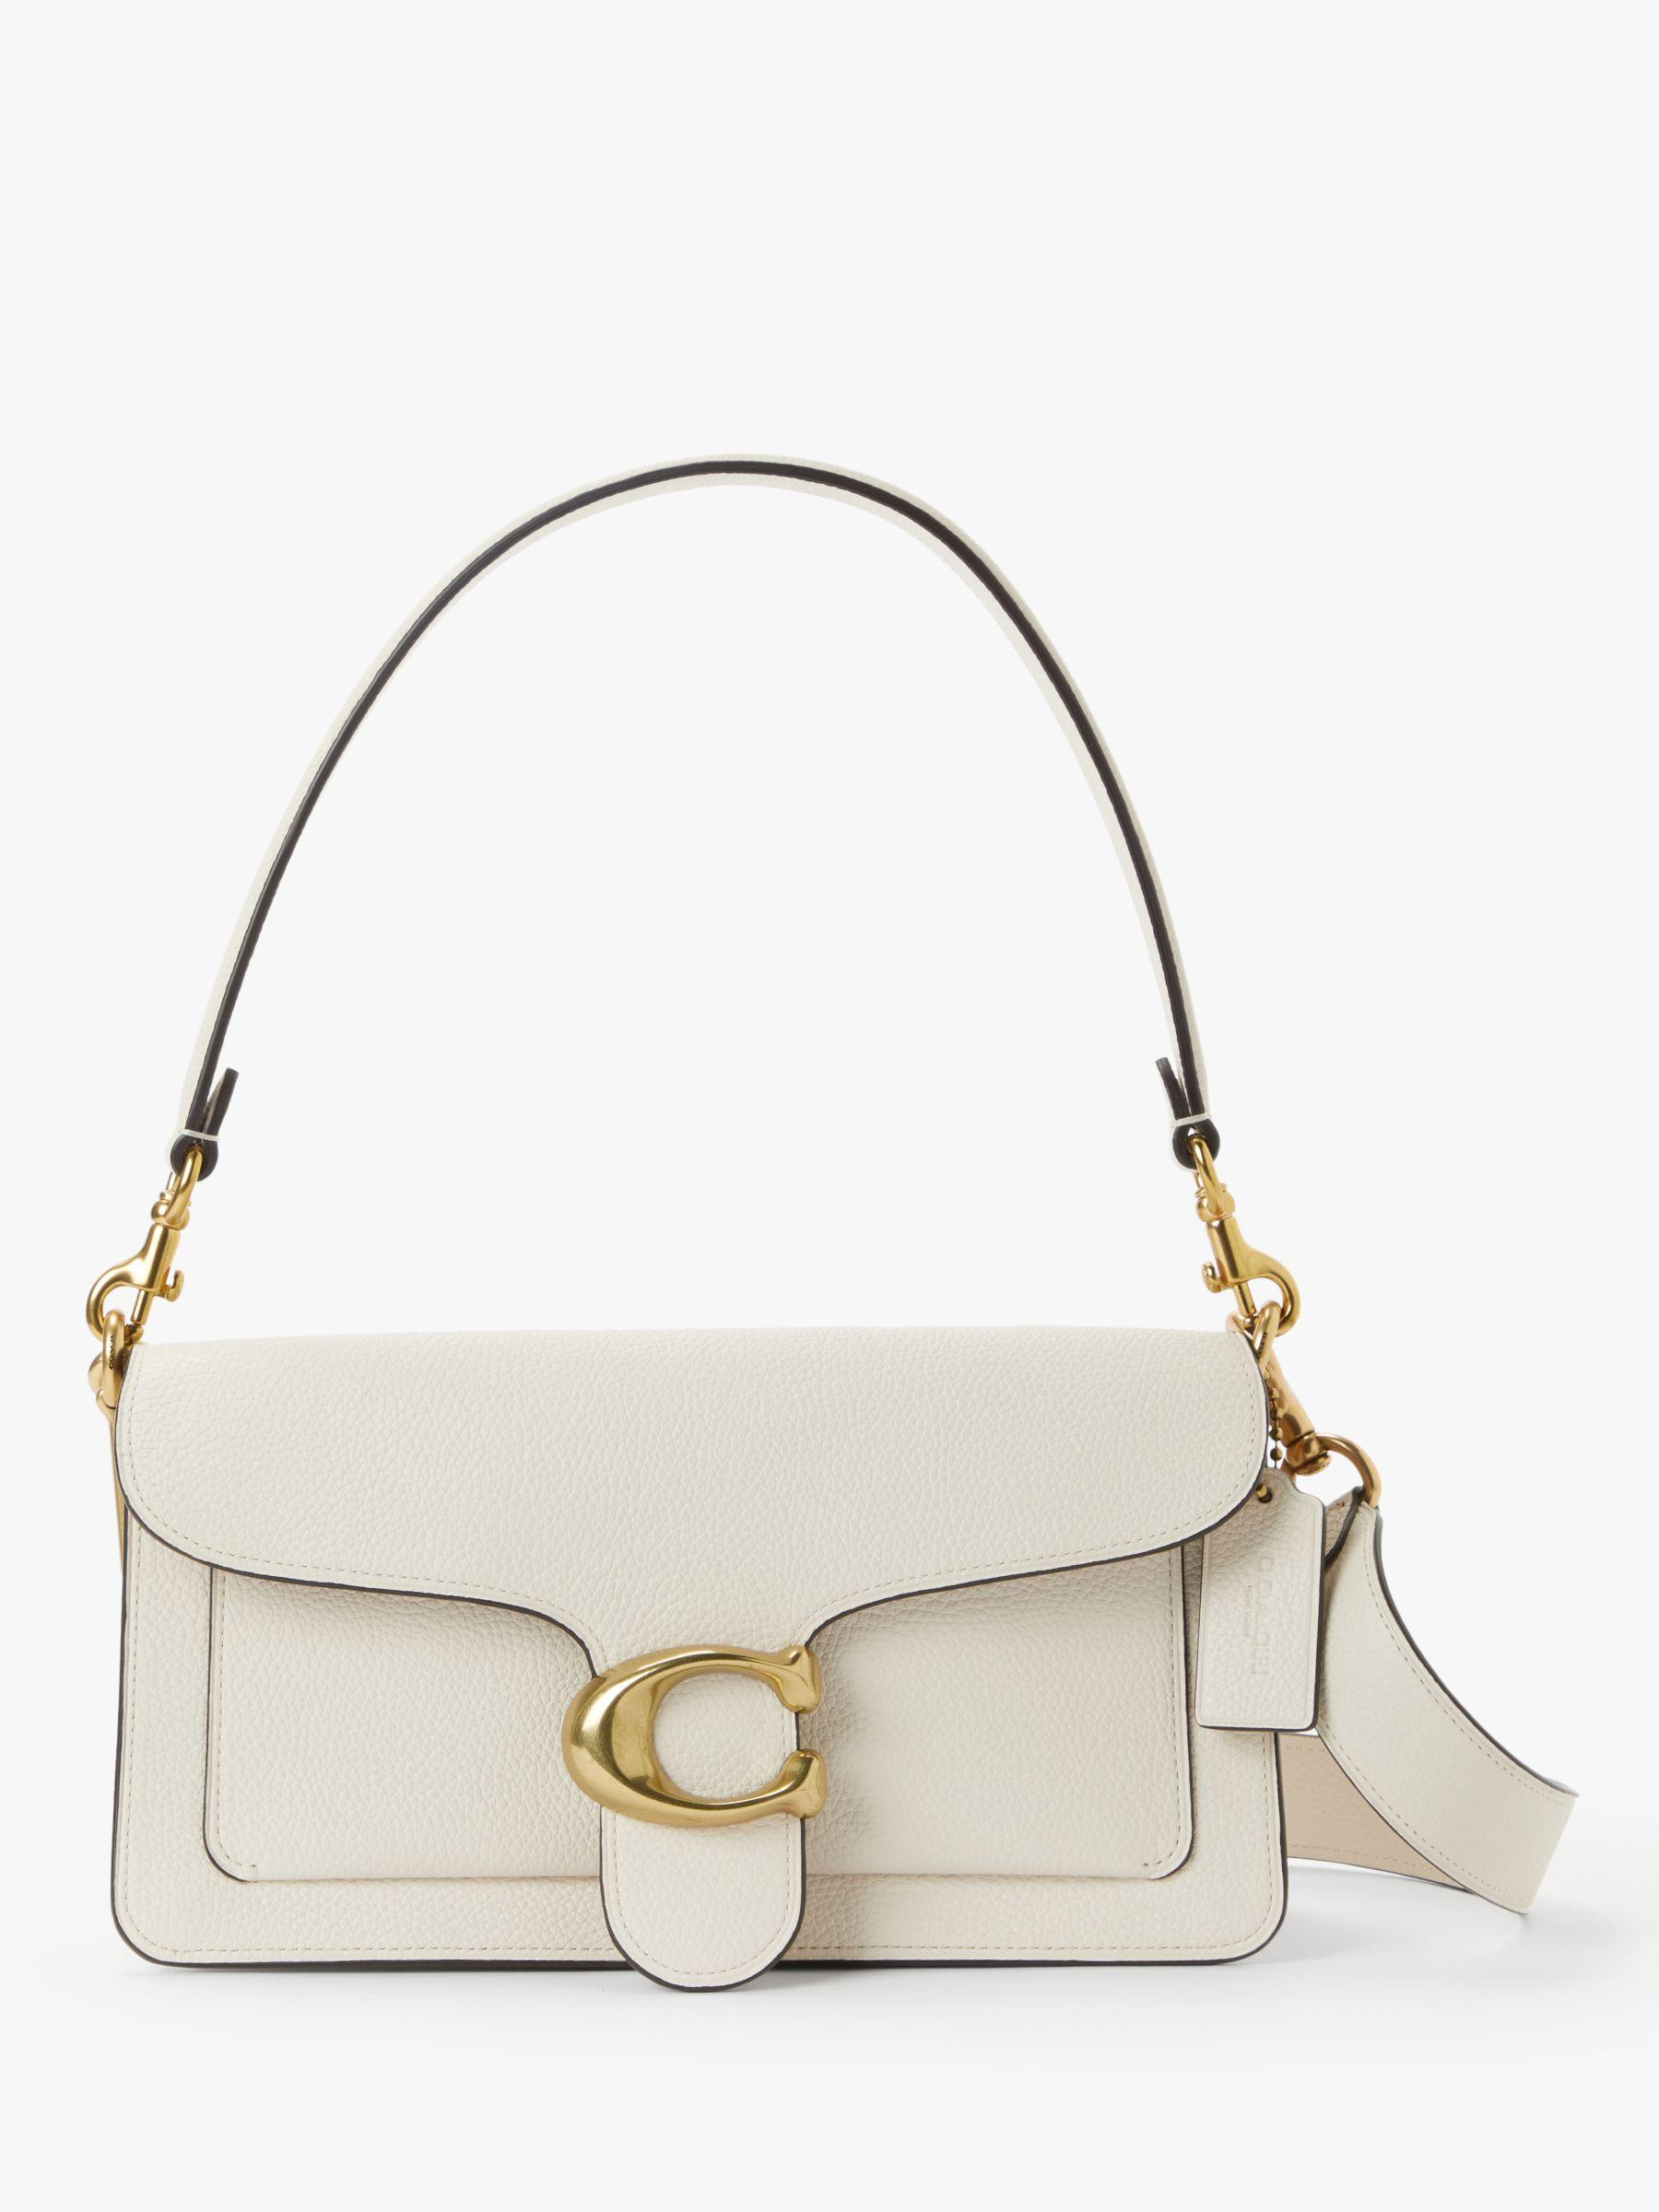 ae8fe4a6f37 COACH Multicolor Tabby 26 Leather Shoulder Bag